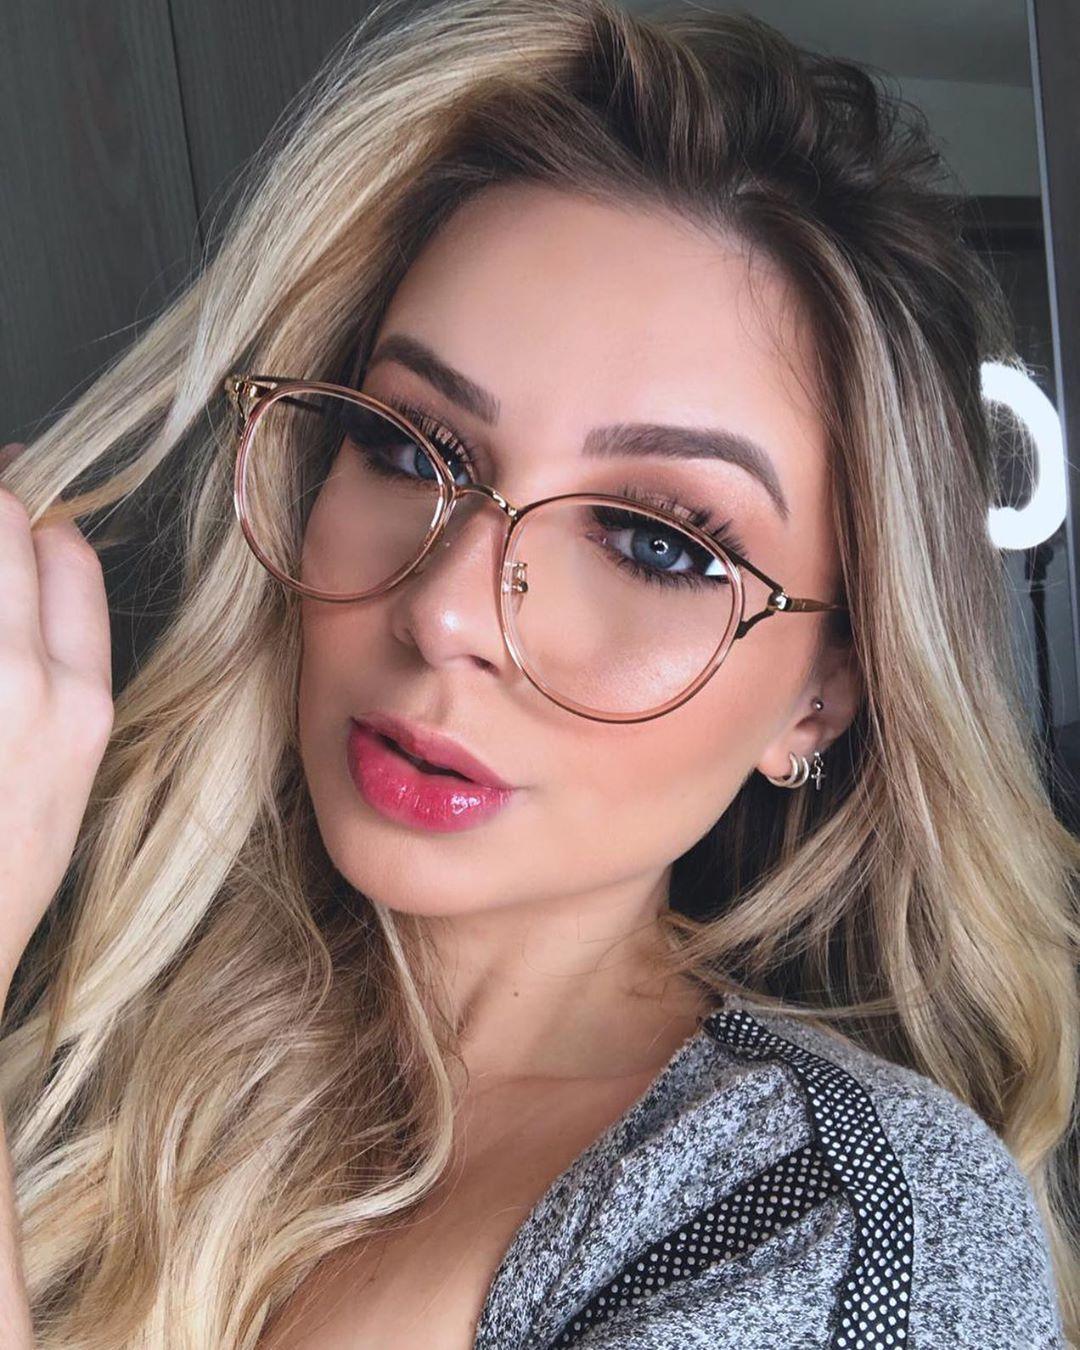 99 Oculos Italian Design On Instagram Voltou Pro Site